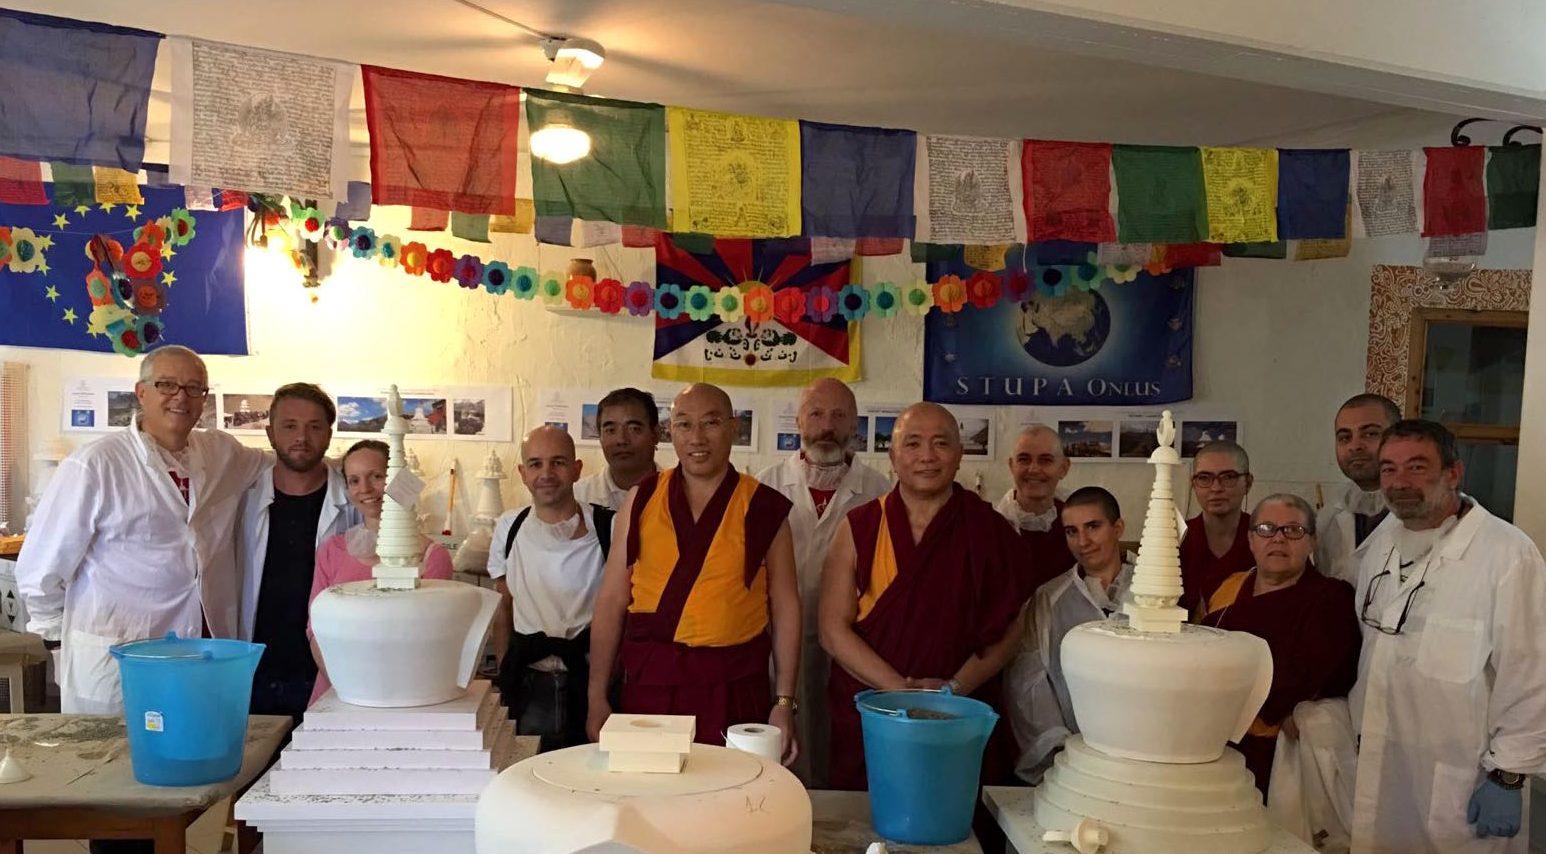 Stupa onlus